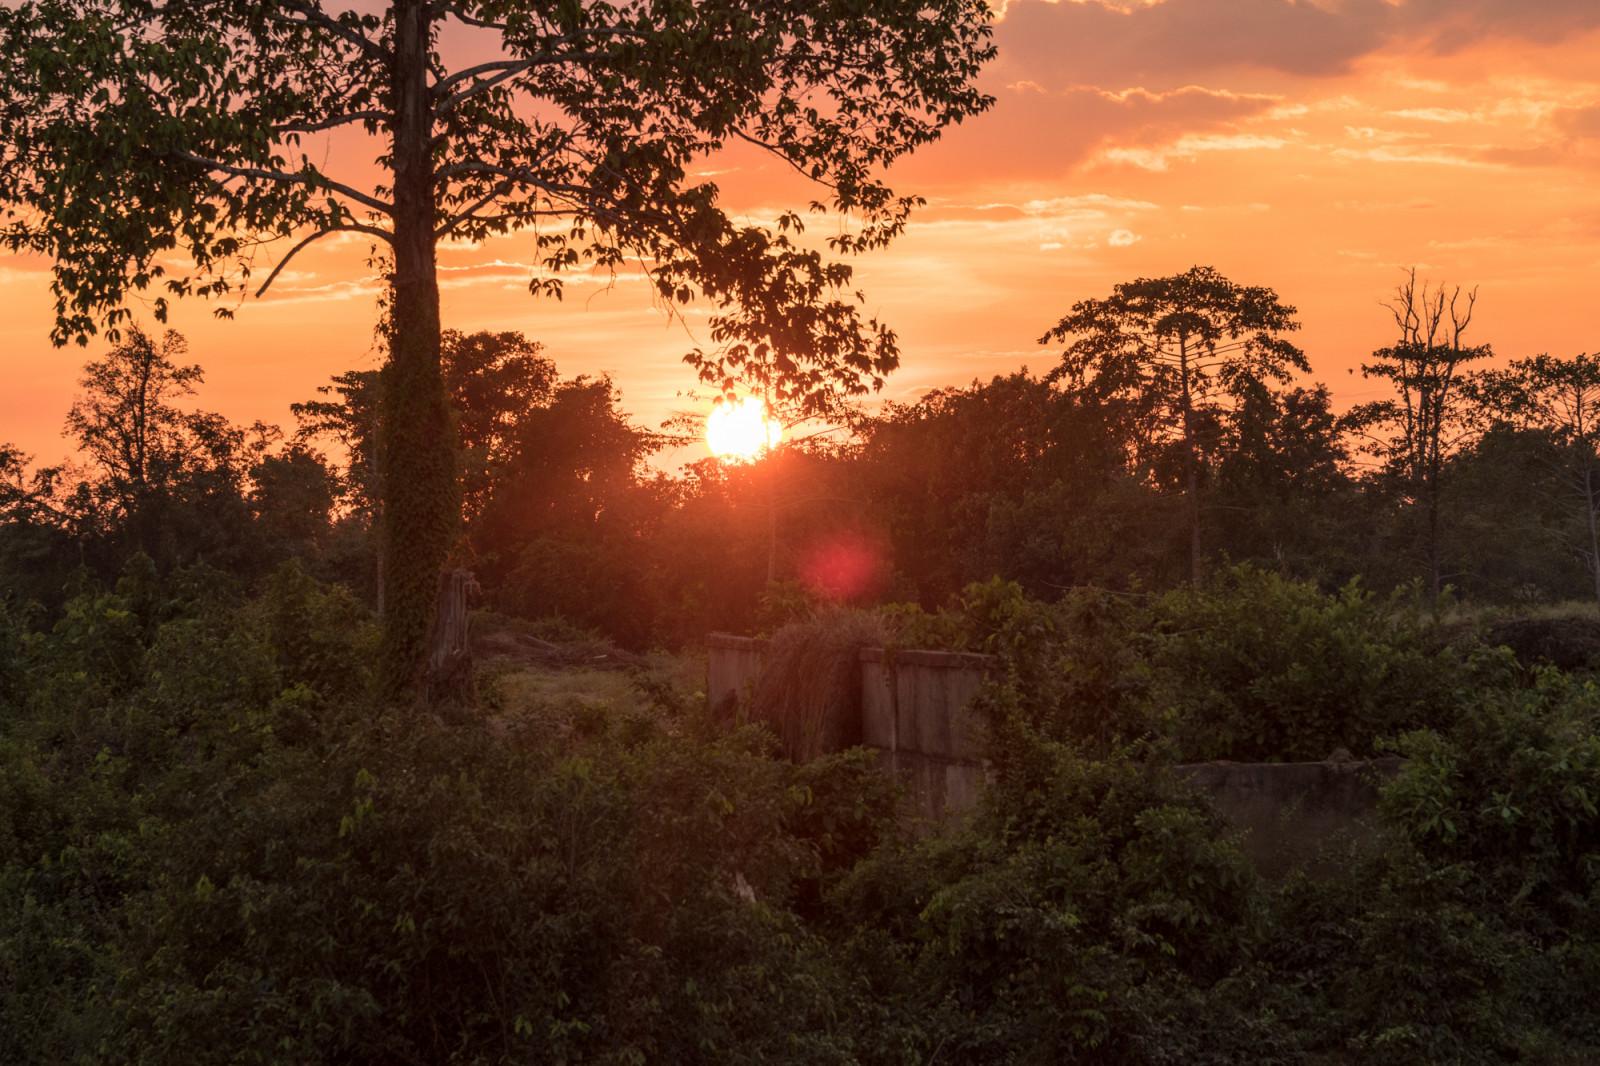 cambodia-photo-tours-jungle-photography-sunset